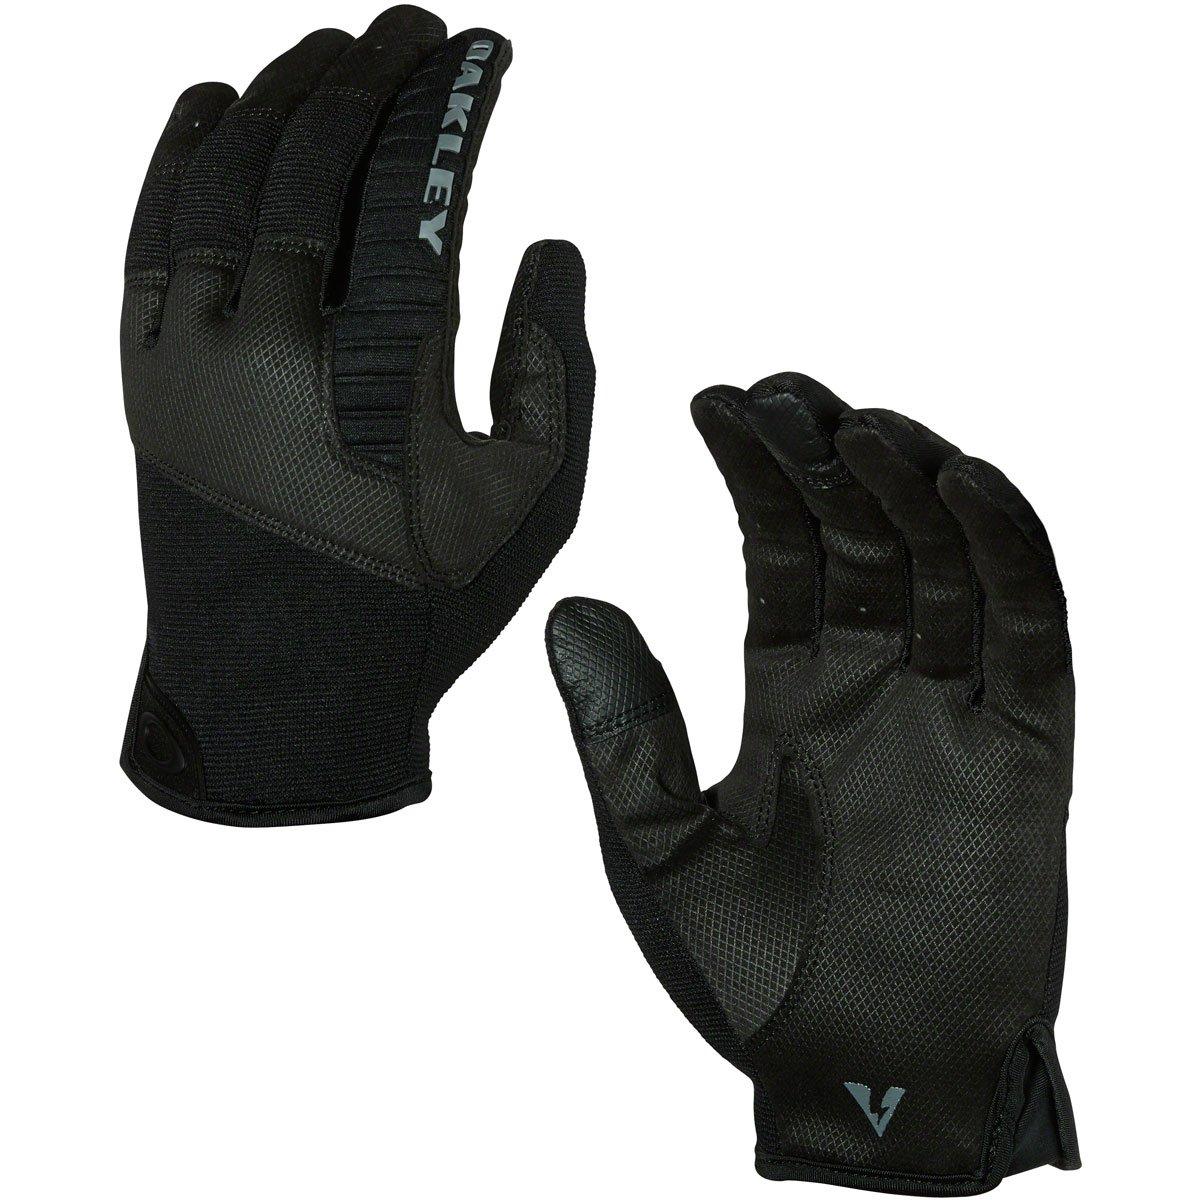 Oakley Mens Factory Lite Tactical Glove, Jet Black, Large